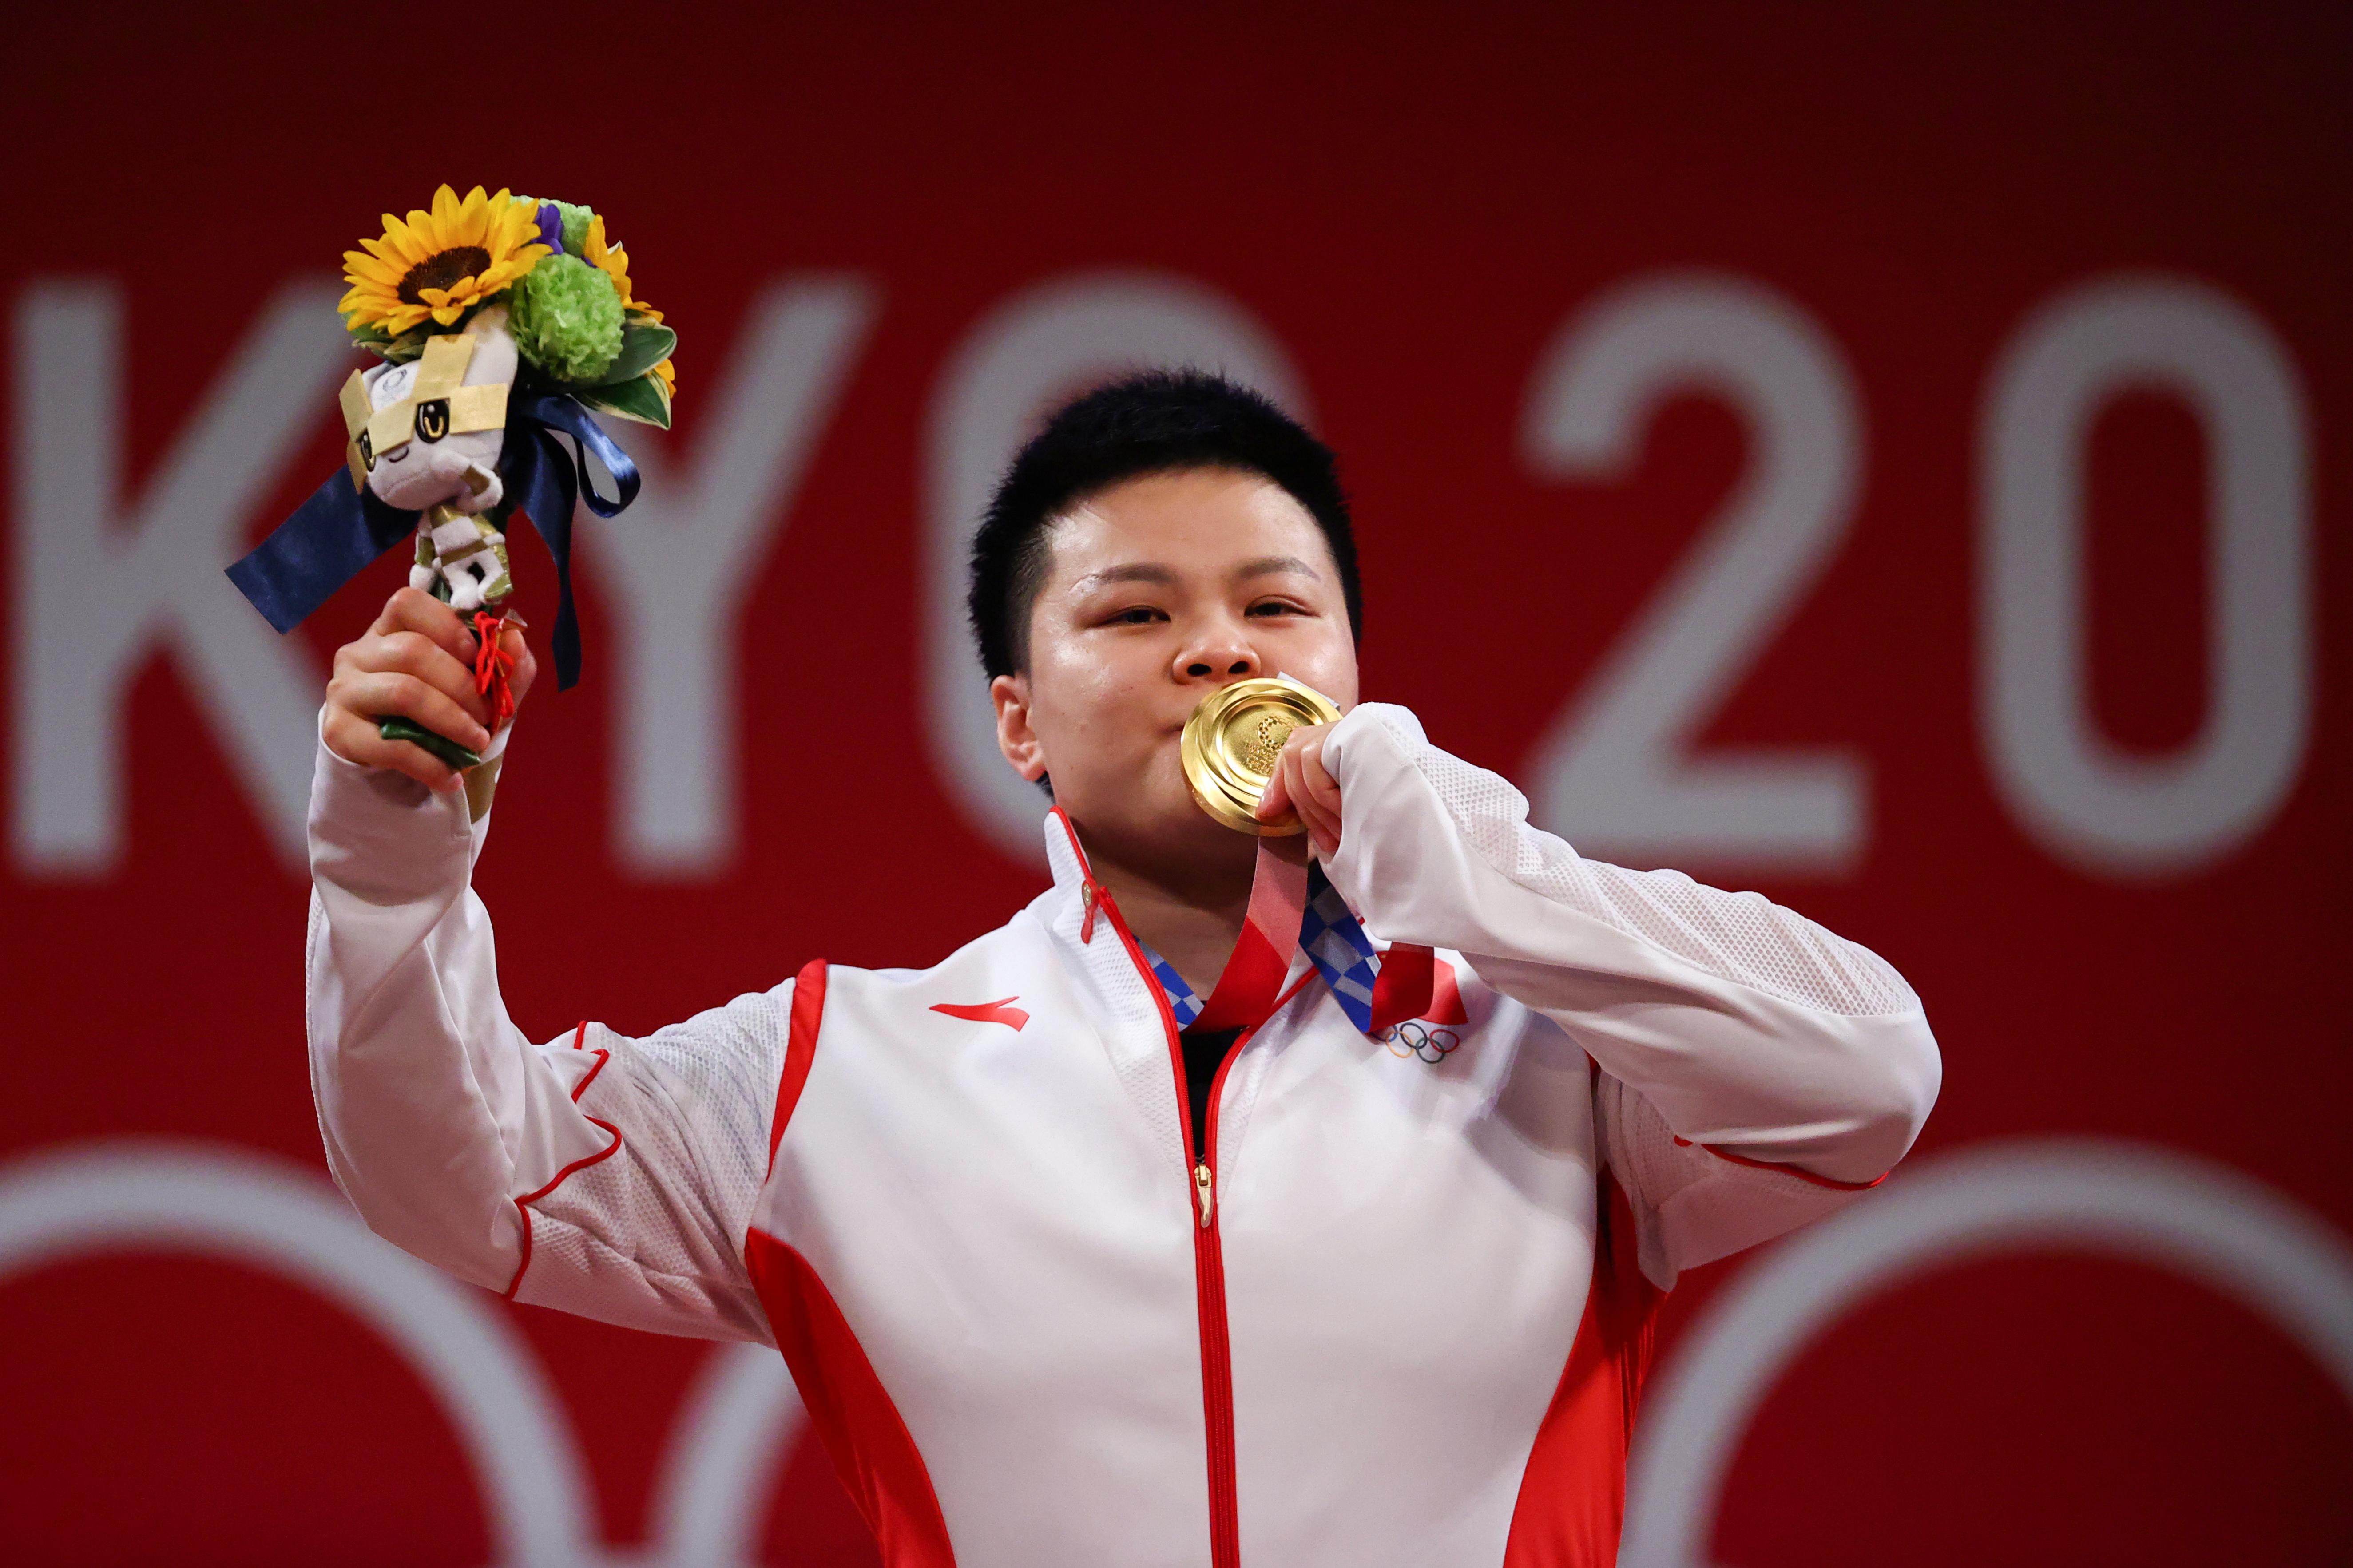 Tokyo 2020 Olympics - Weightlifting - Women's 87kg - Medal Ceremony - Tokyo International Forum, Tokyo, Japan - August 2, 2021. Gold medalist Wang Zhouyu of China reacts. REUTERS/Edgard Garrido